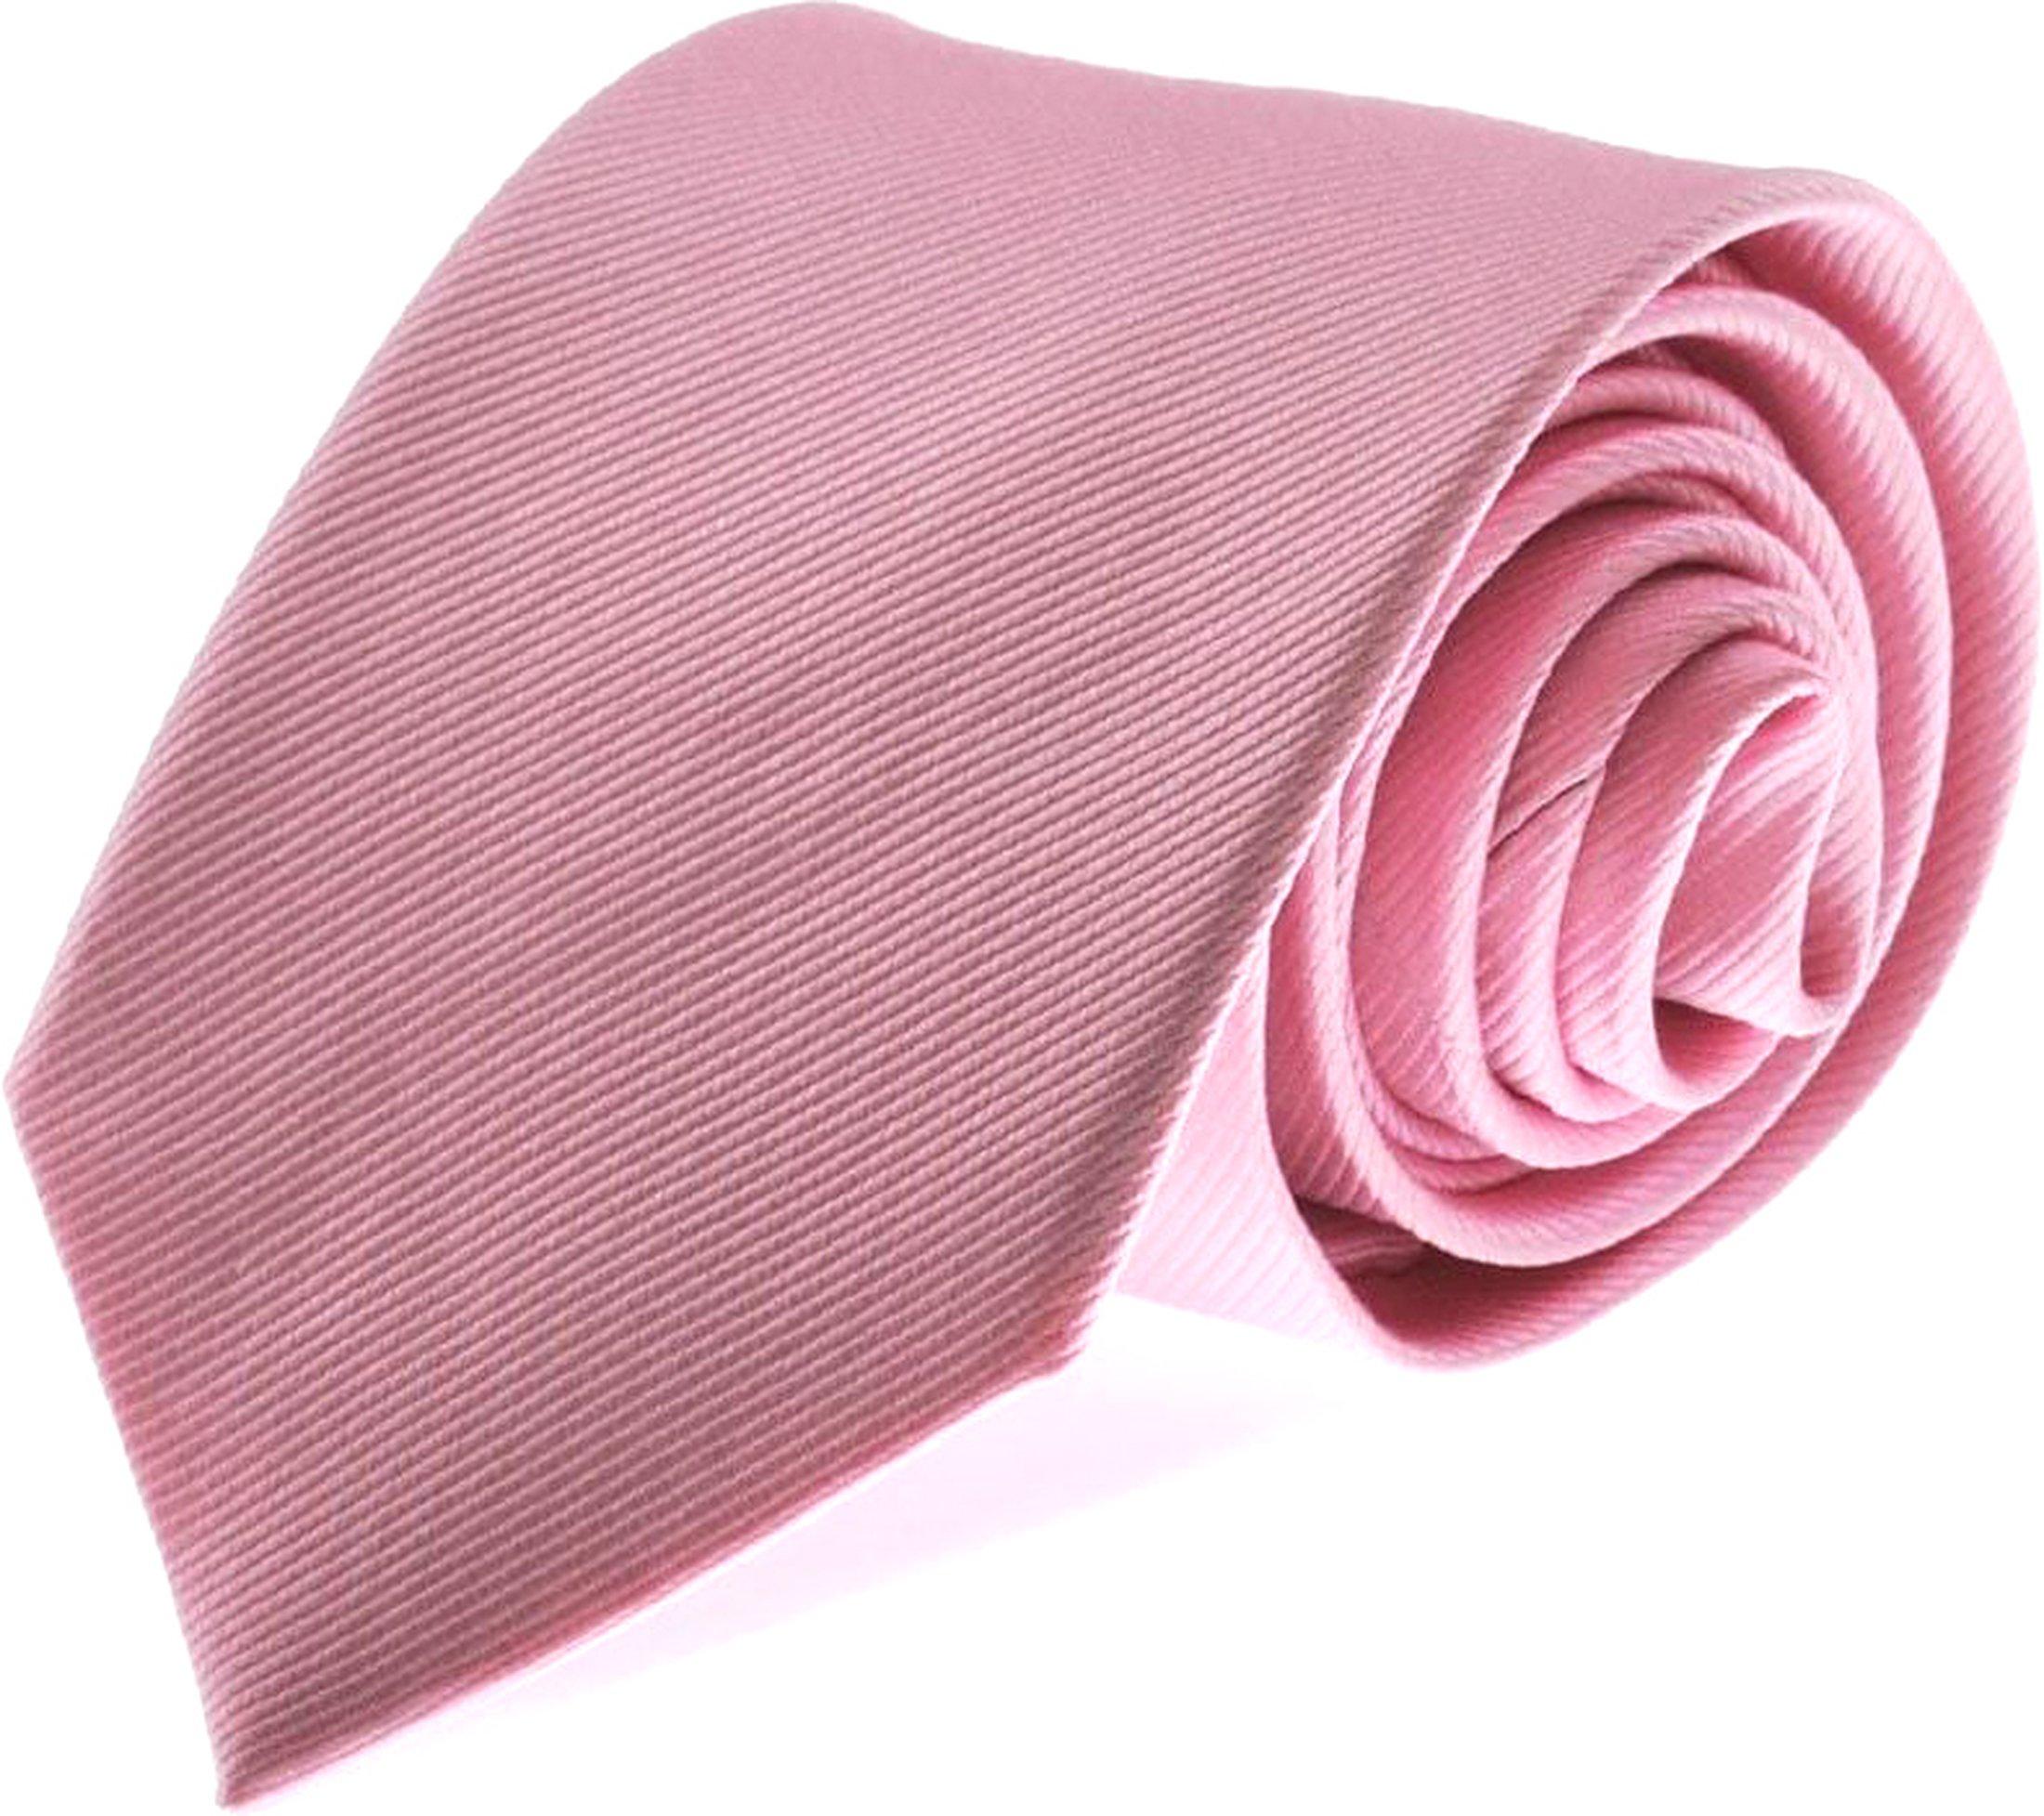 Stropdas Zijde Roze Uni F03 foto 0